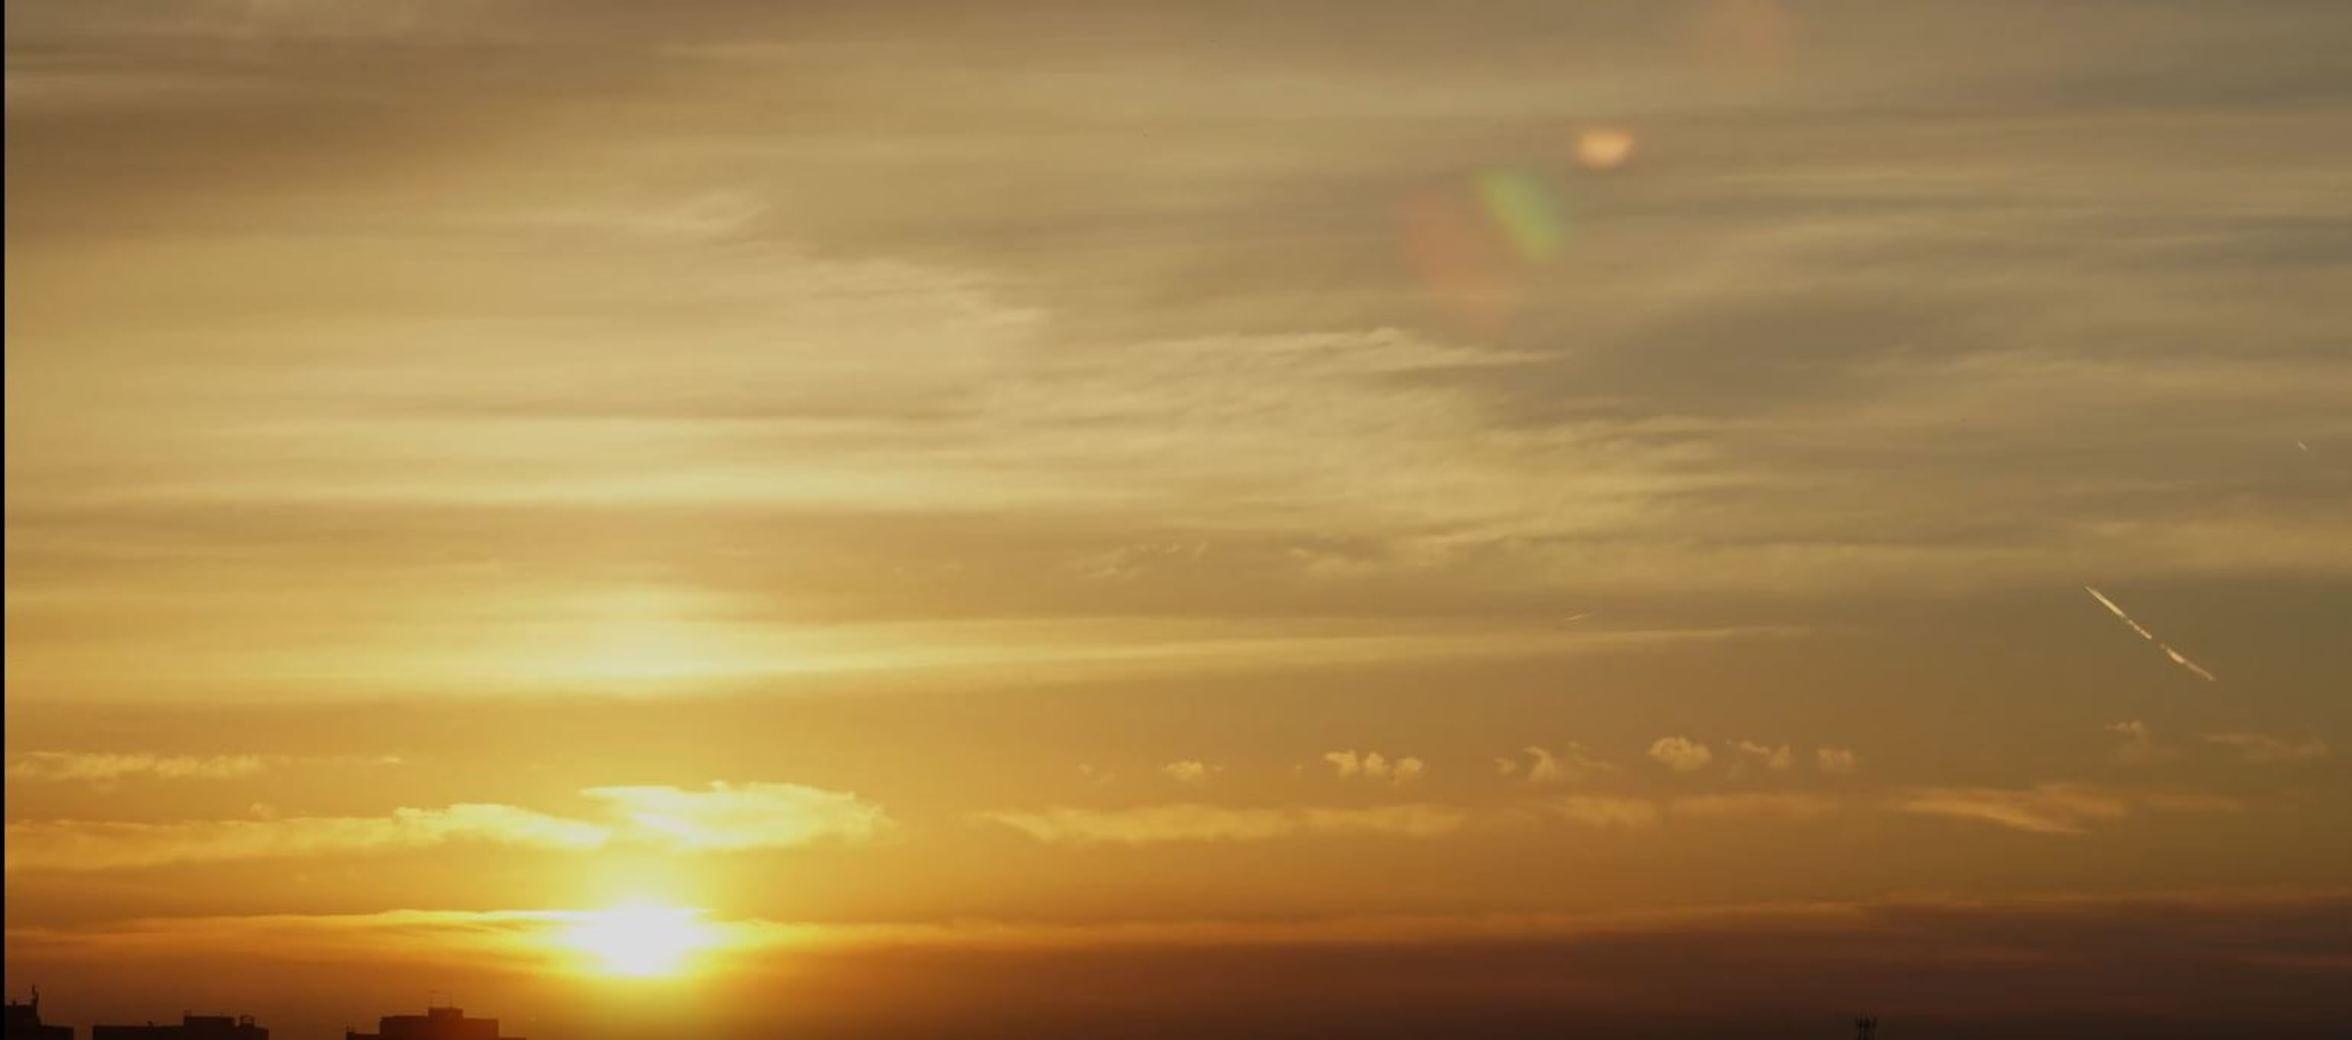 VIP_Sunset_Video_2352x1040